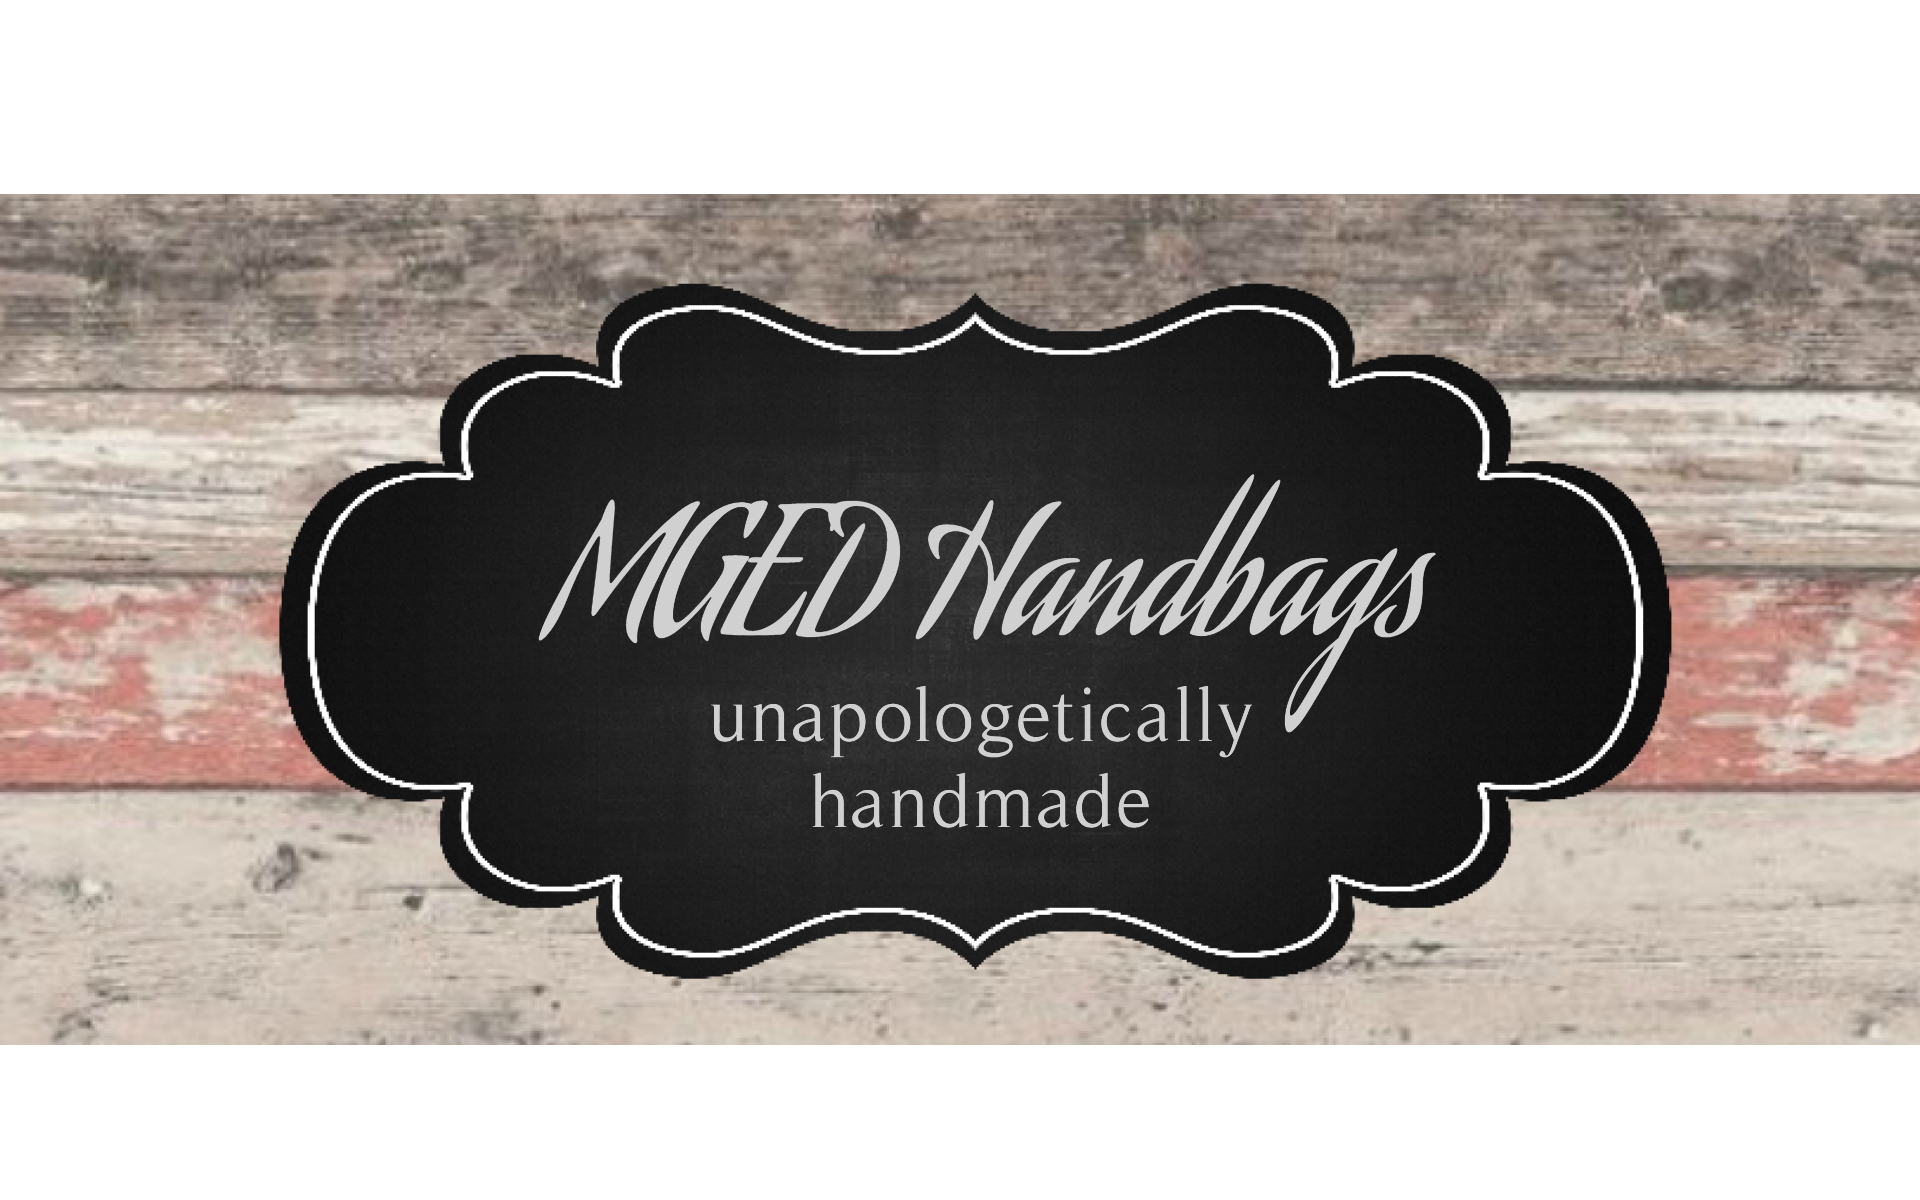 MGED Handbags